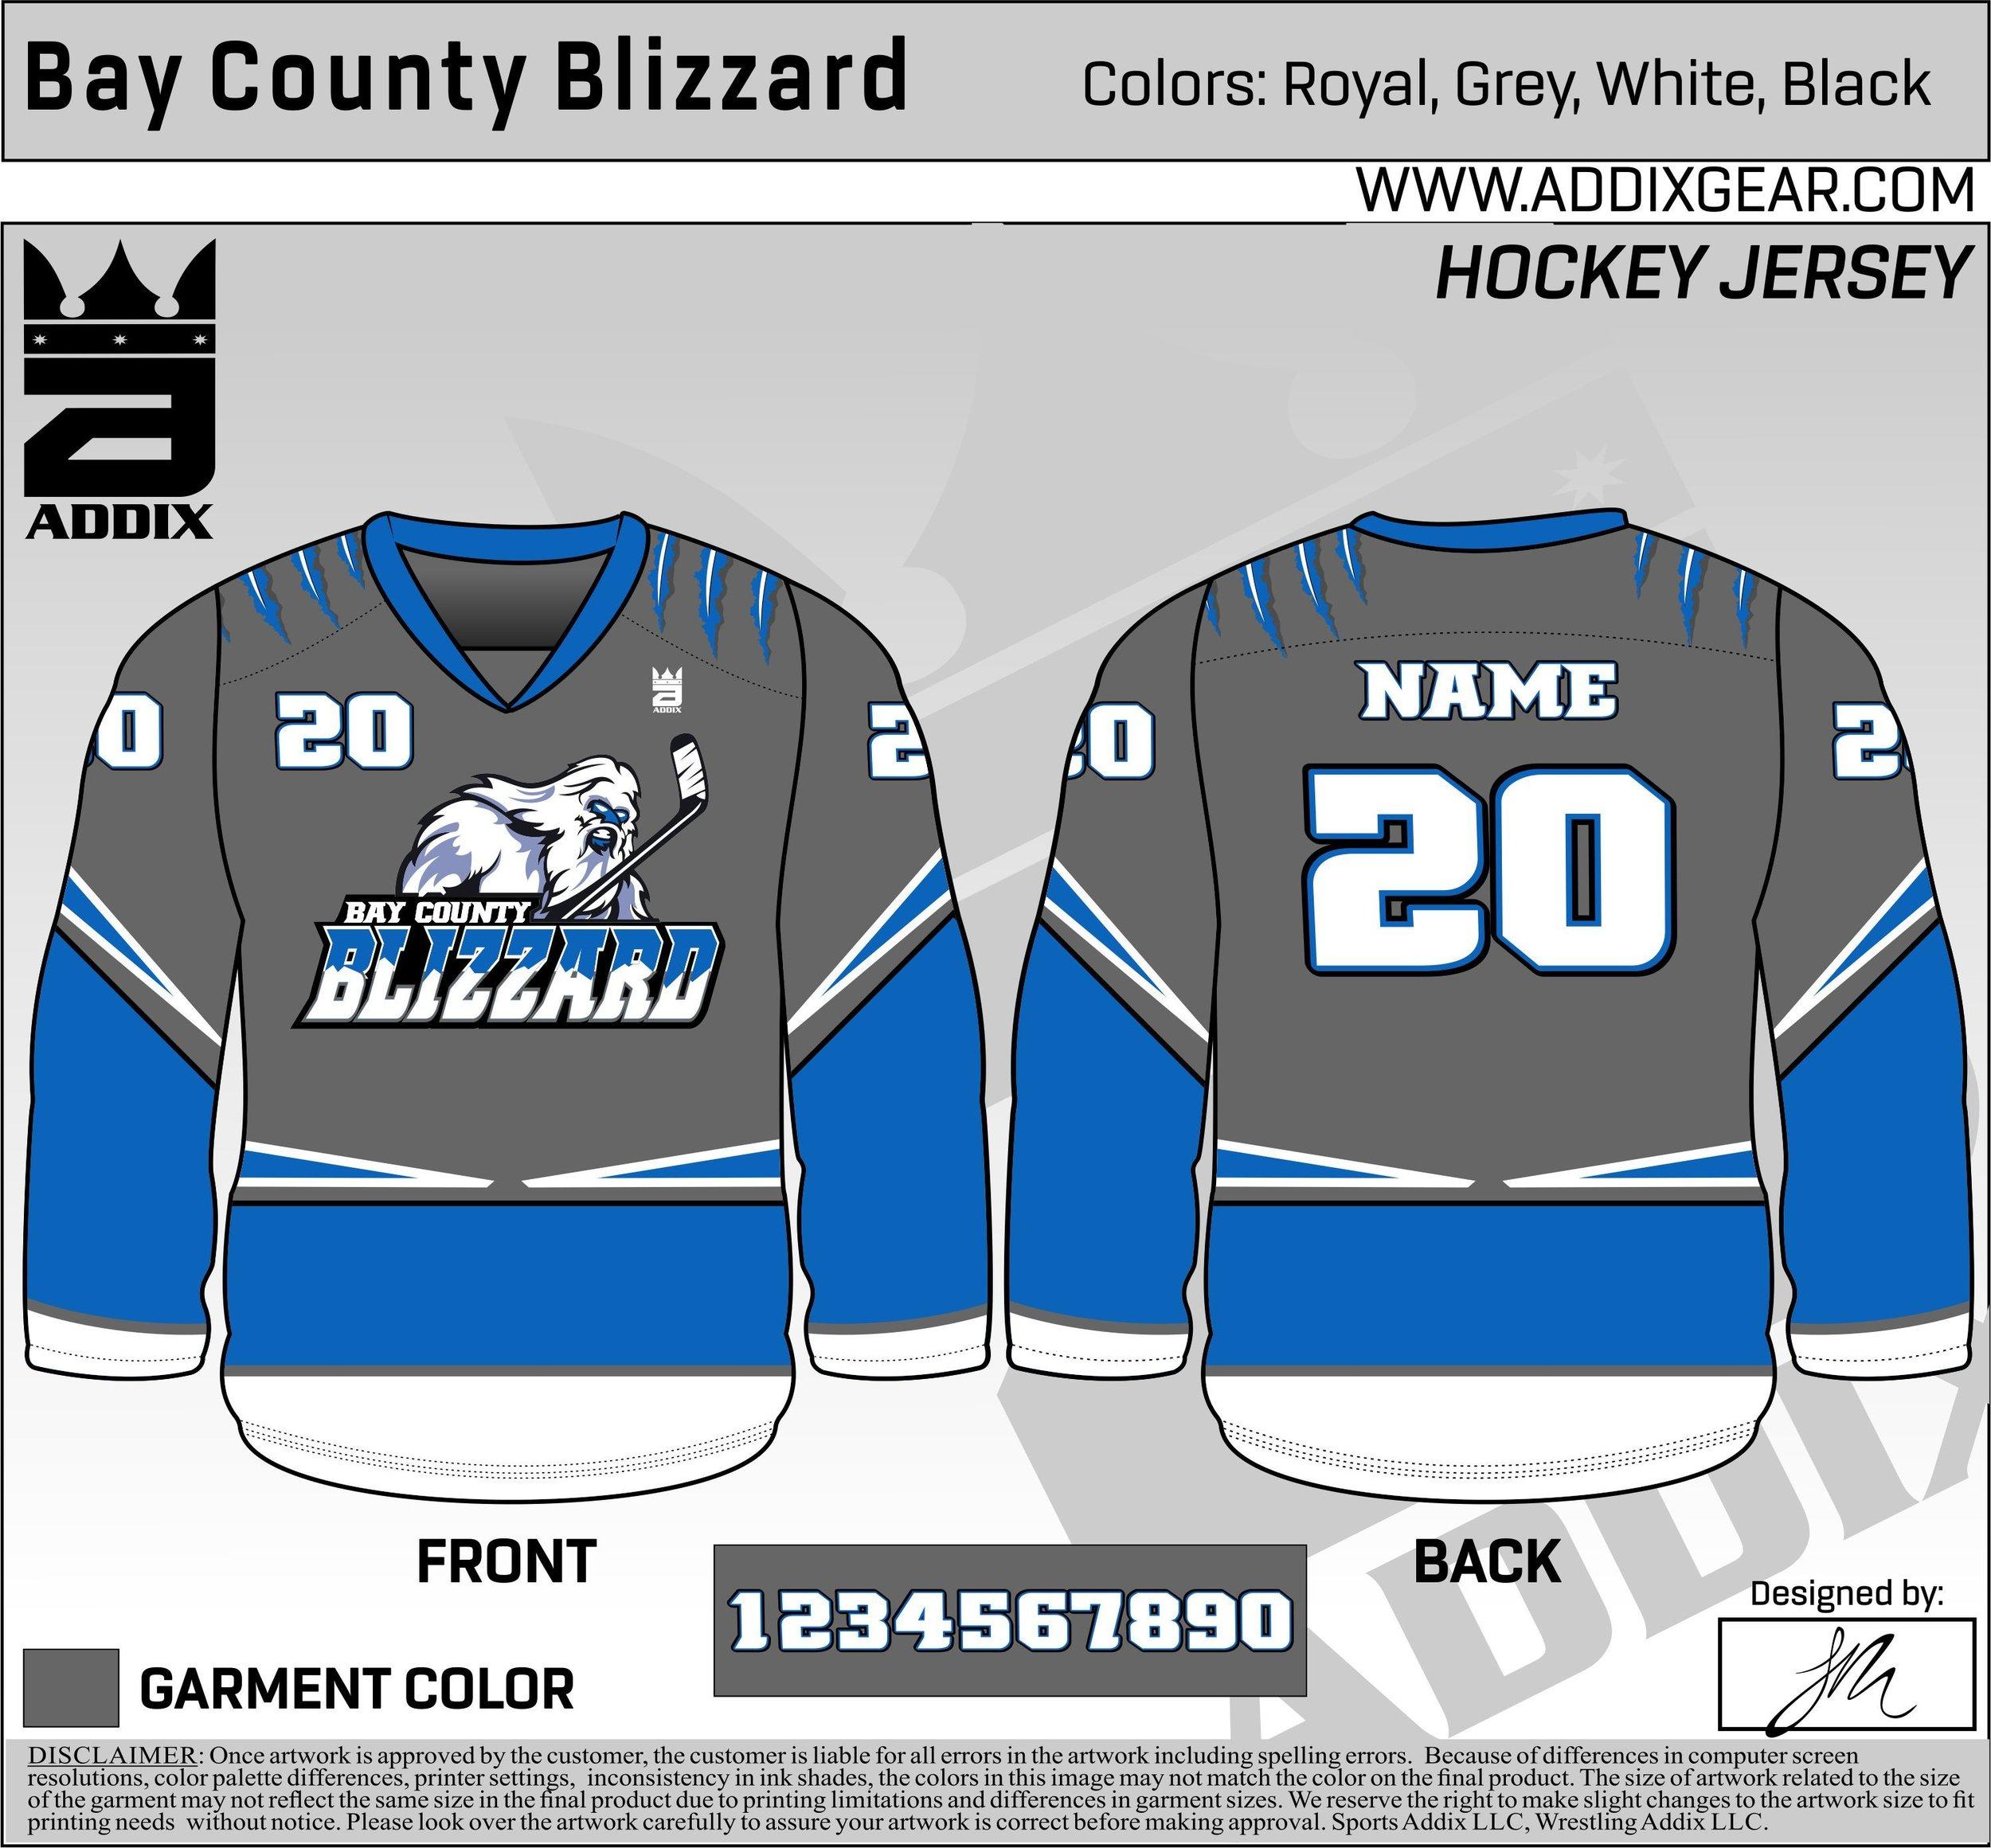 hockey jersey colors